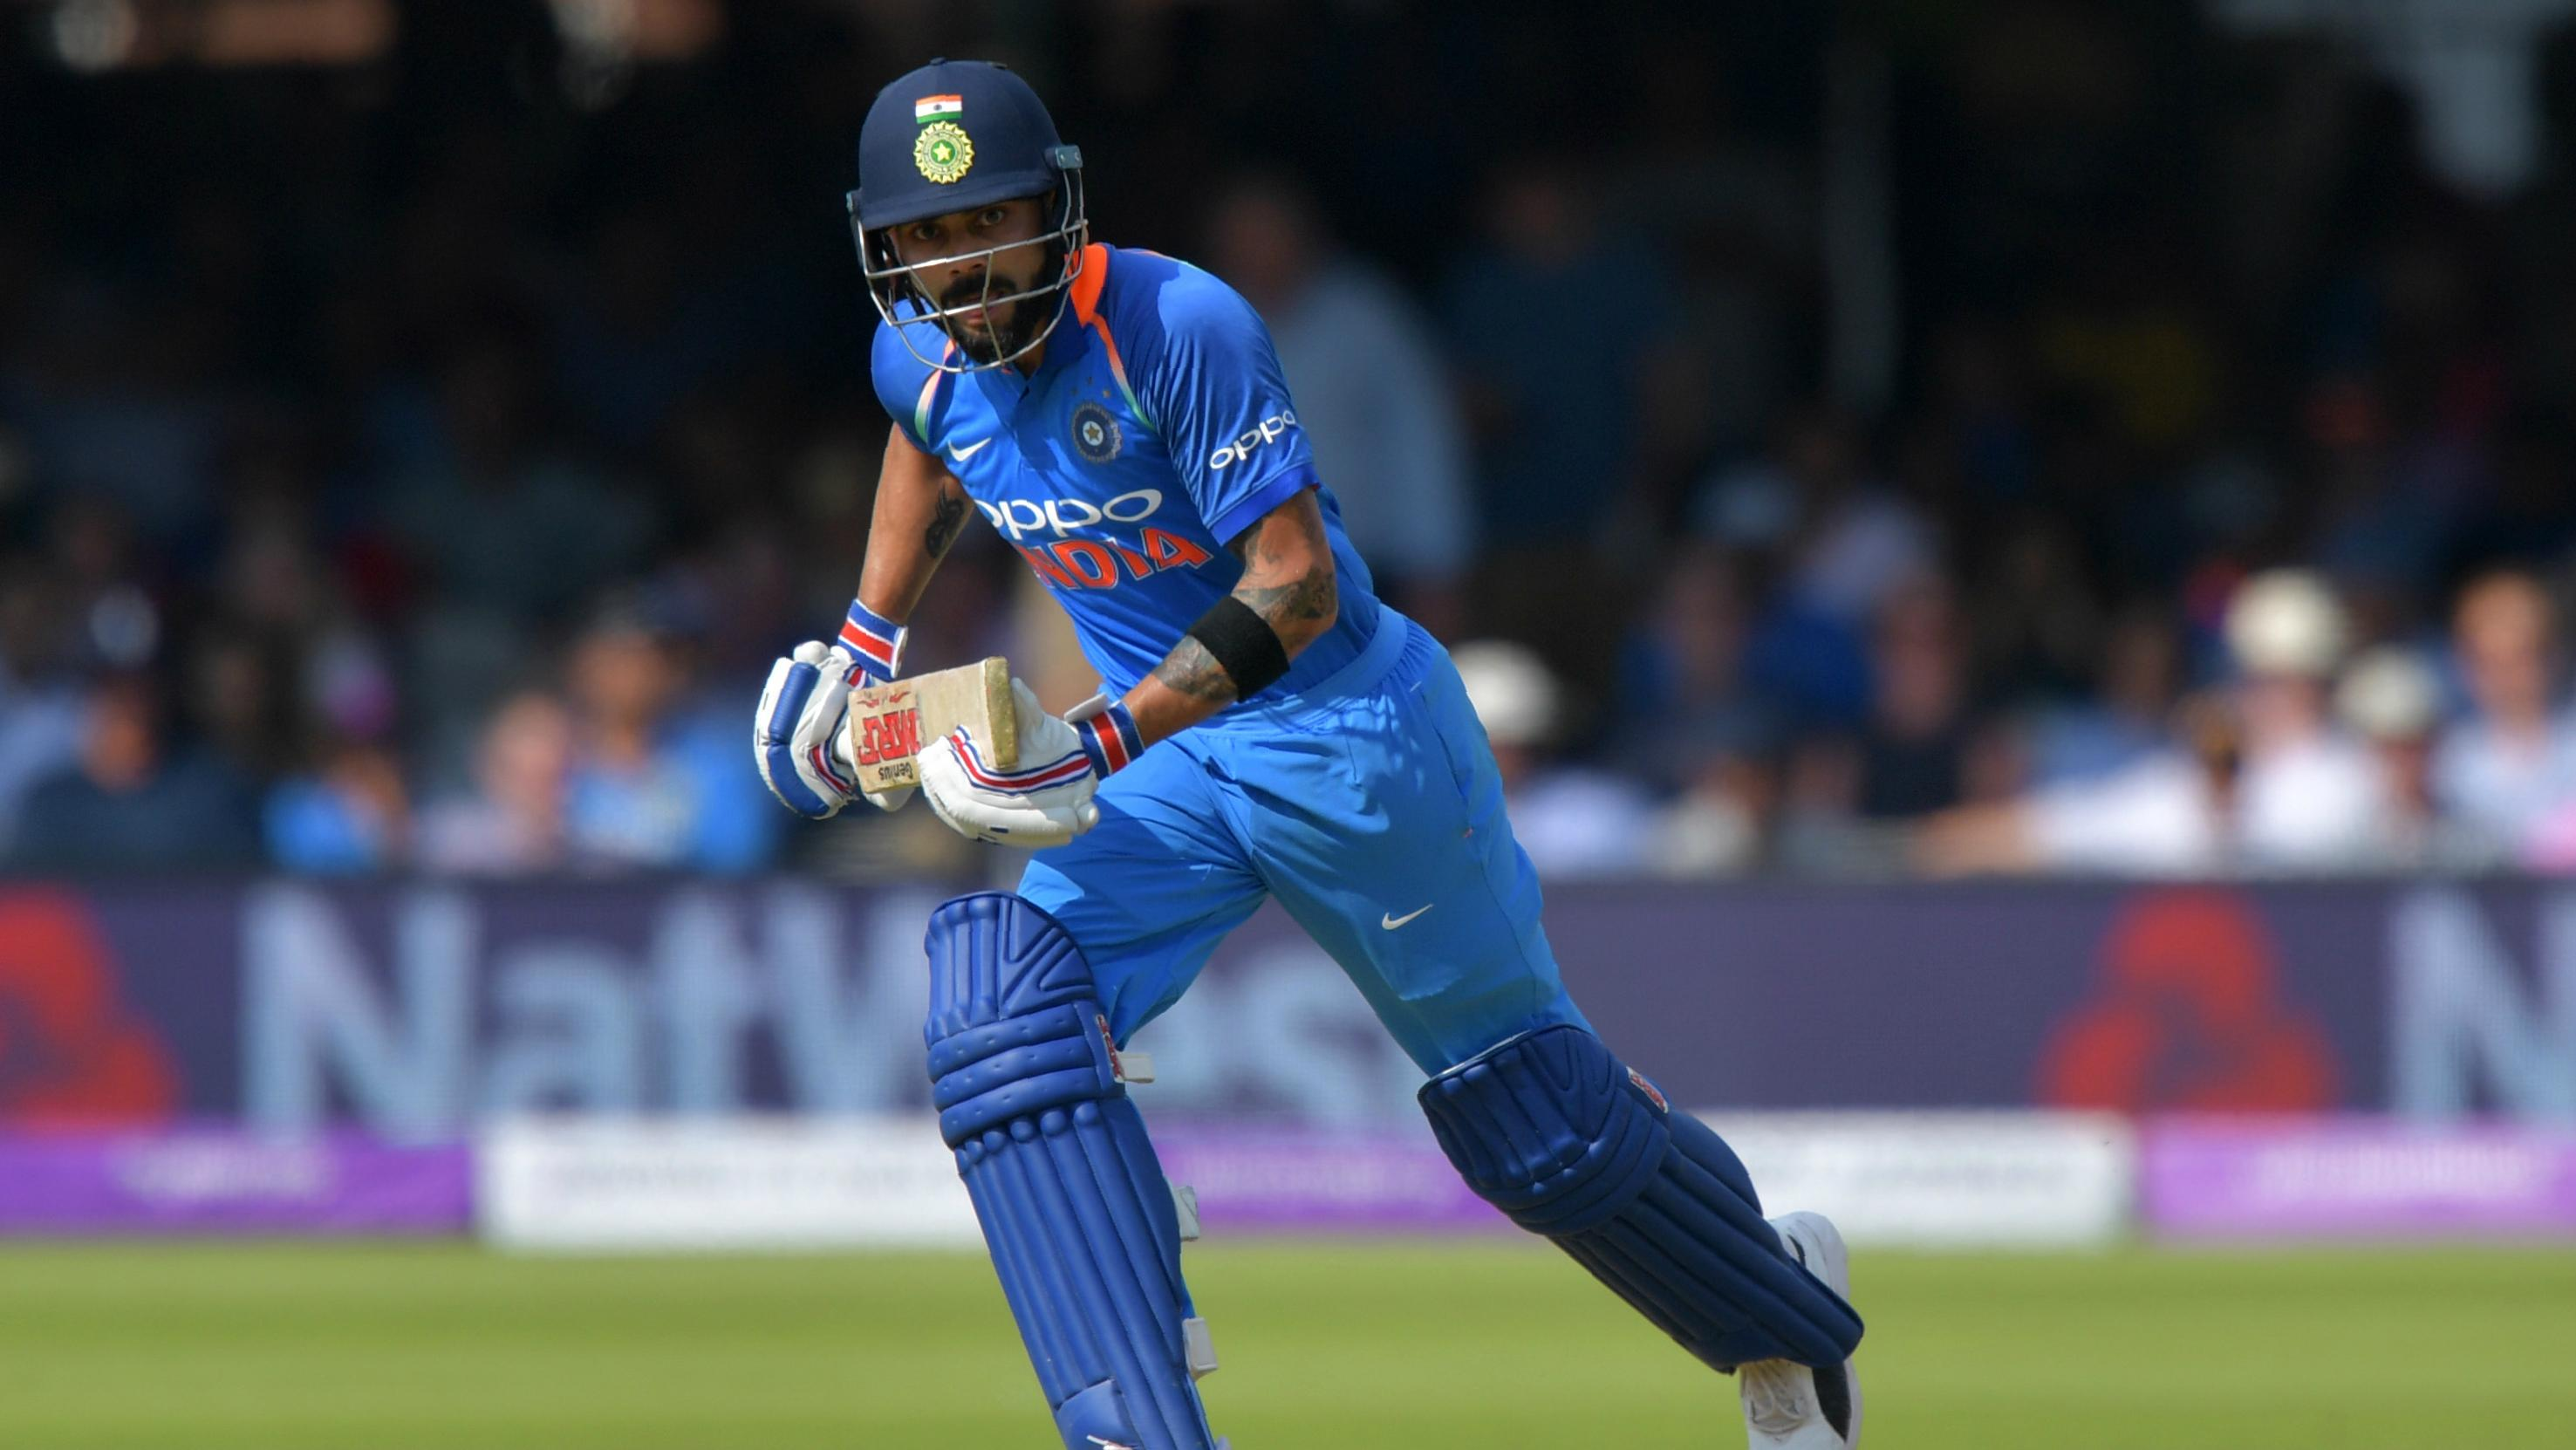 Virat Kohli Dangerous Batsman